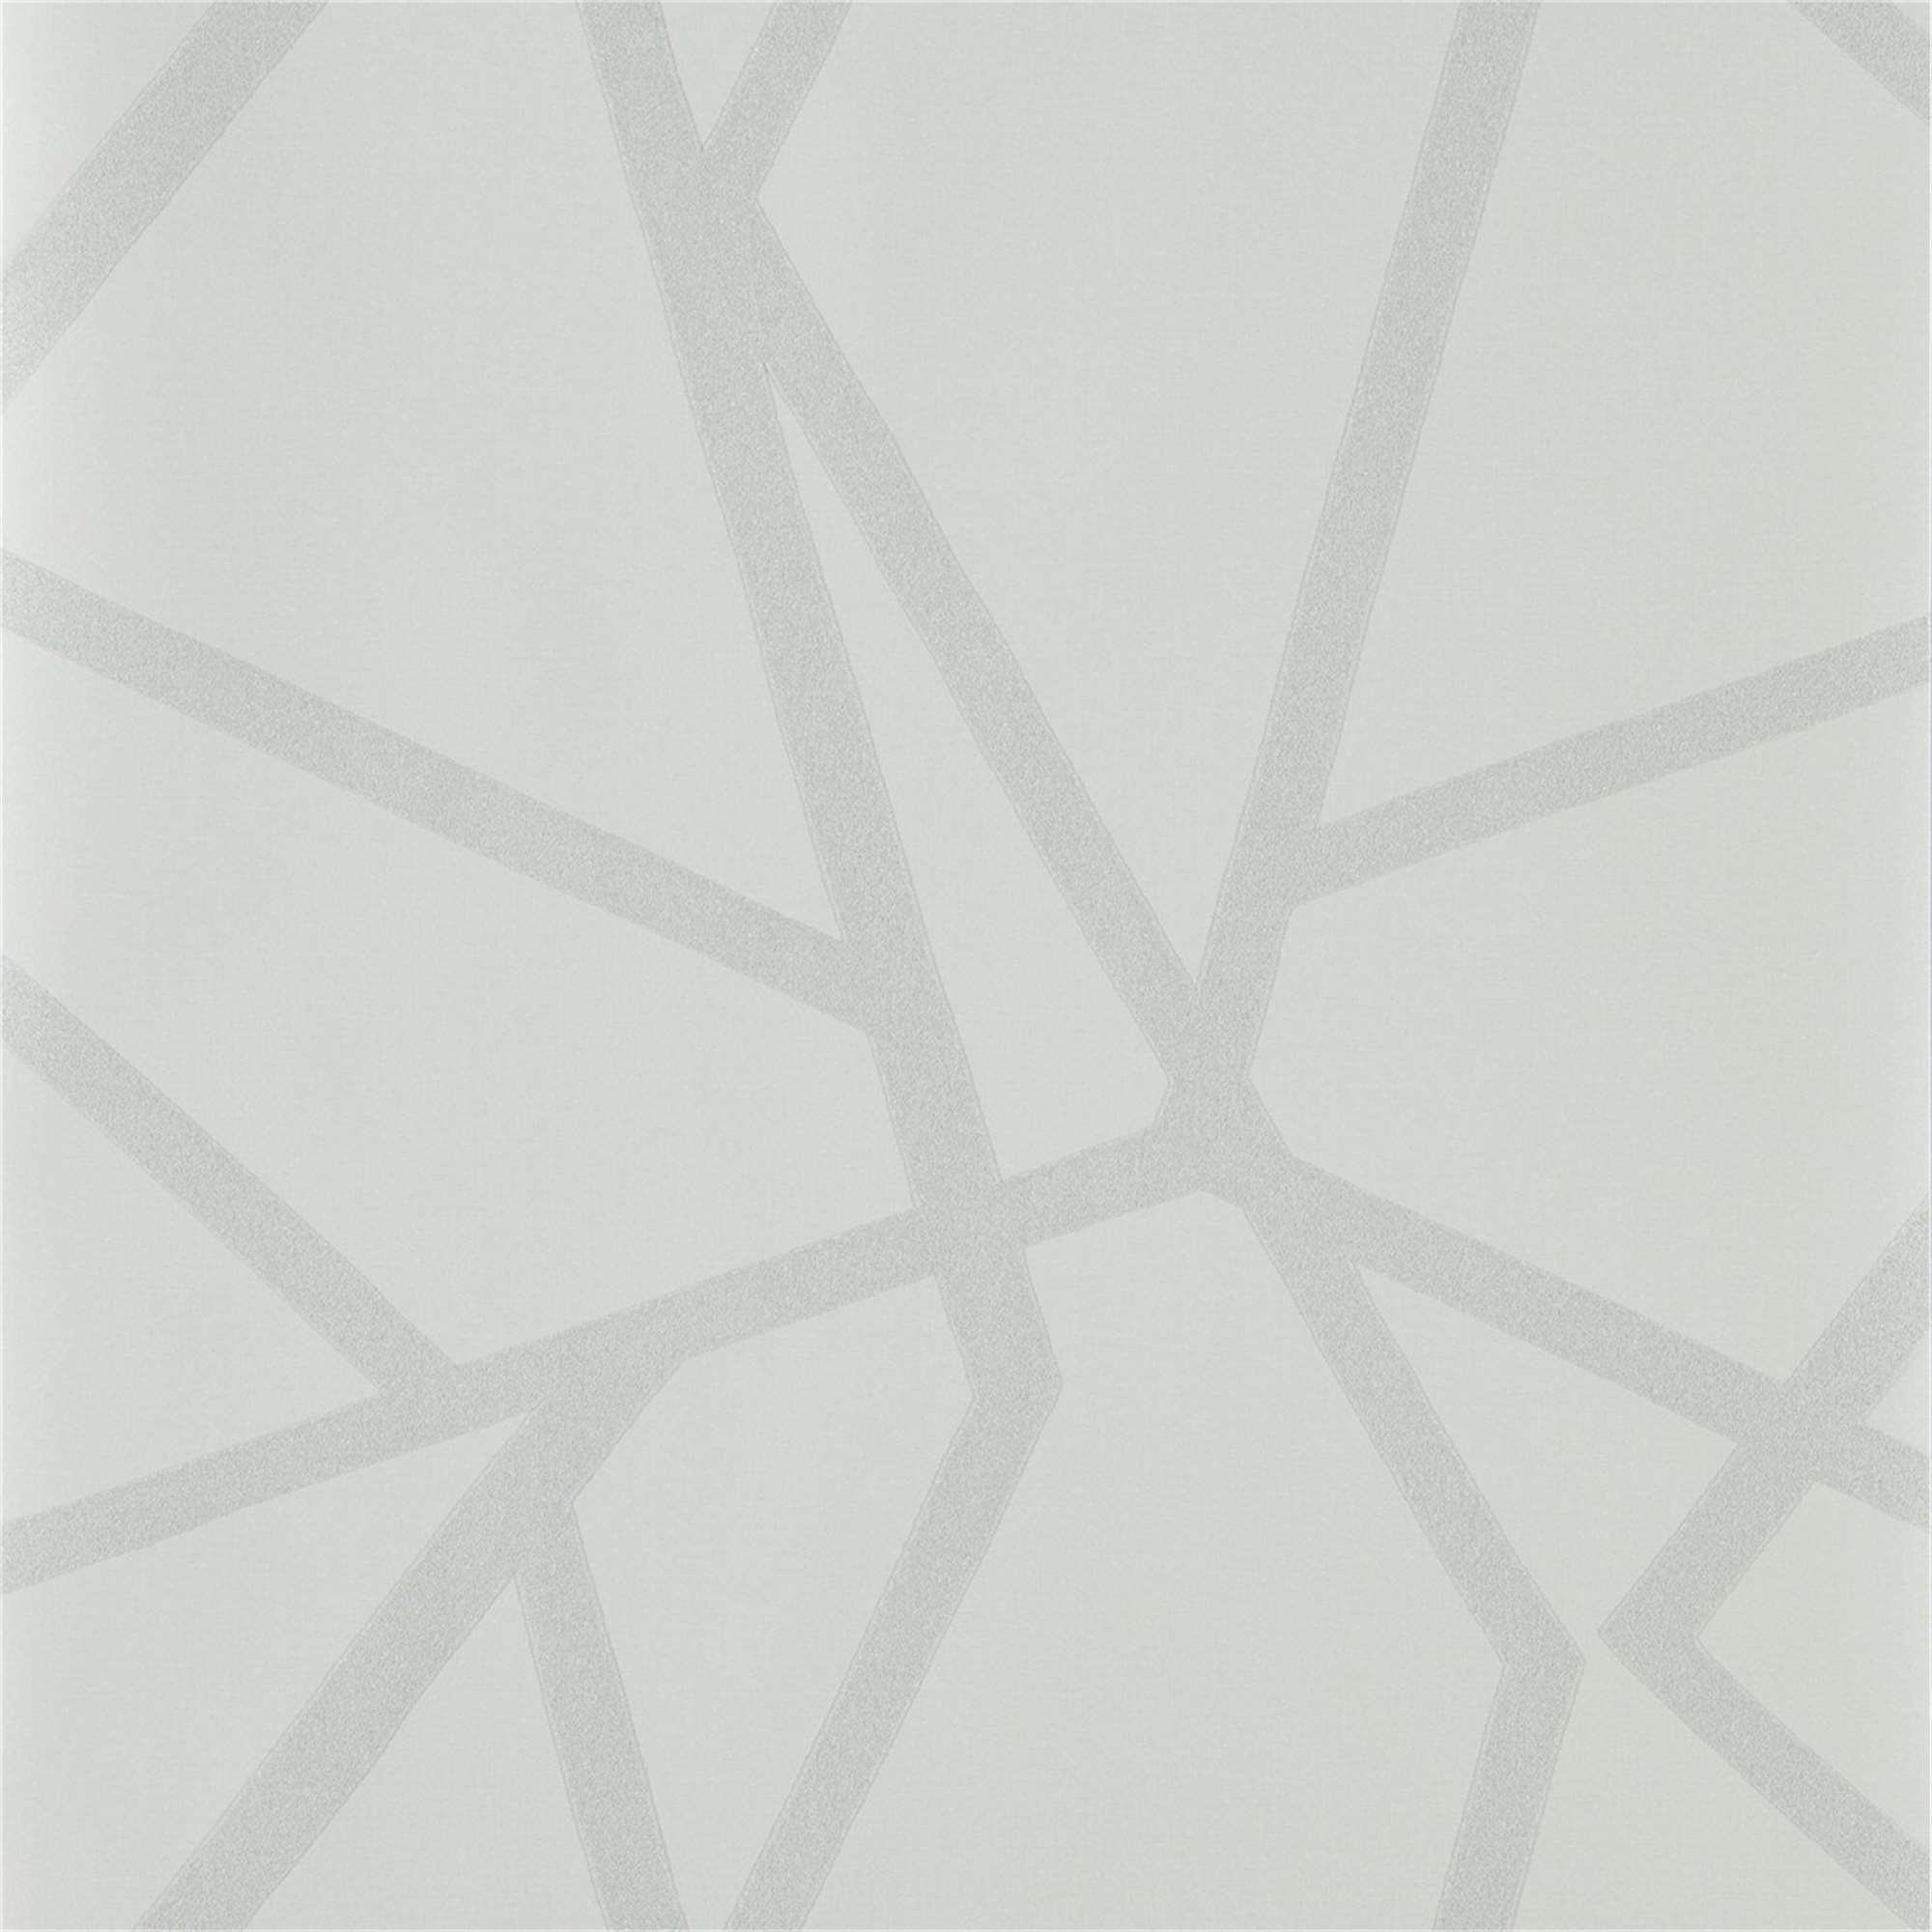 Rotolo carta da parati fantasia geometrica tina codazzo home for Rotolo carta parati